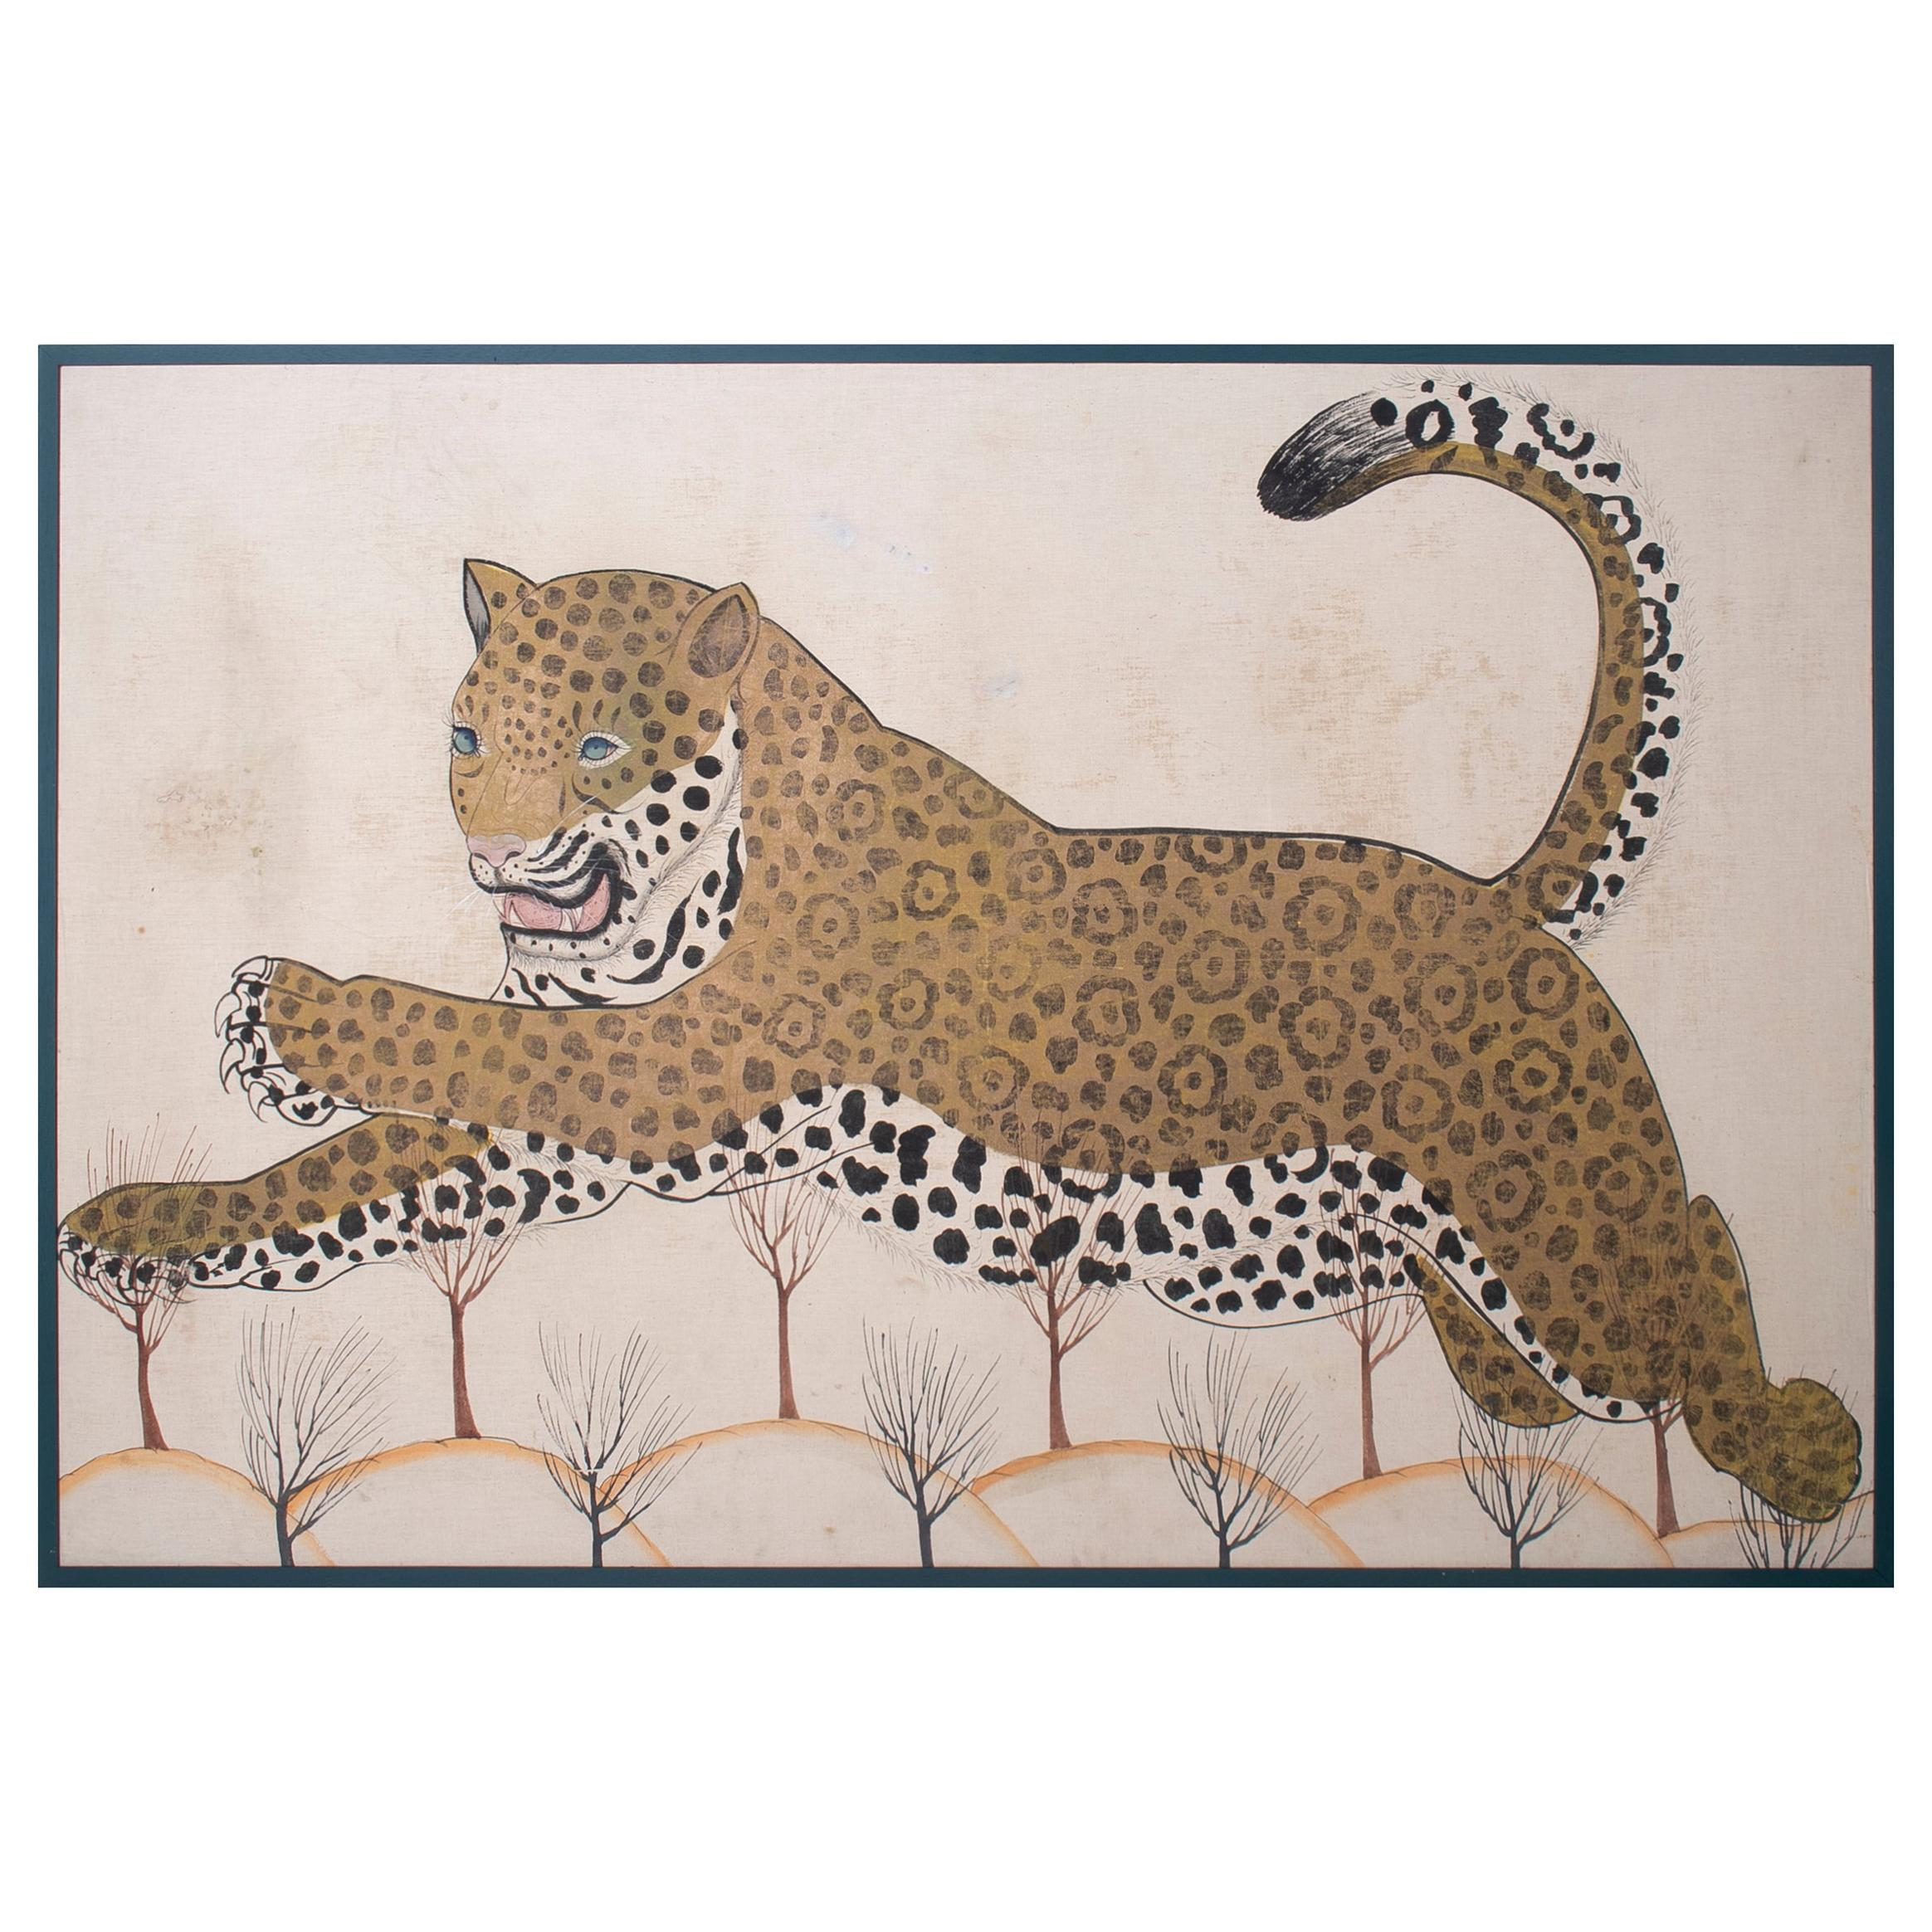 1980s Jaime Parlade Designer Framed Hand Drawn Cheetah on Canvas